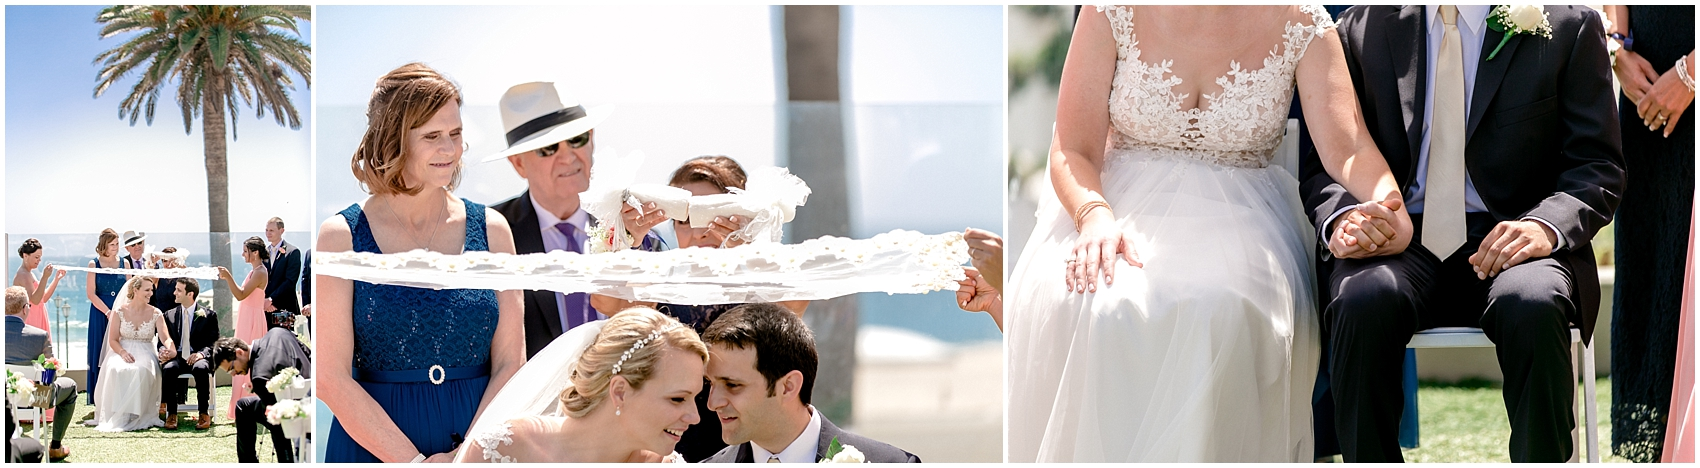 Jen and Mark's Wedding-0398.jpg